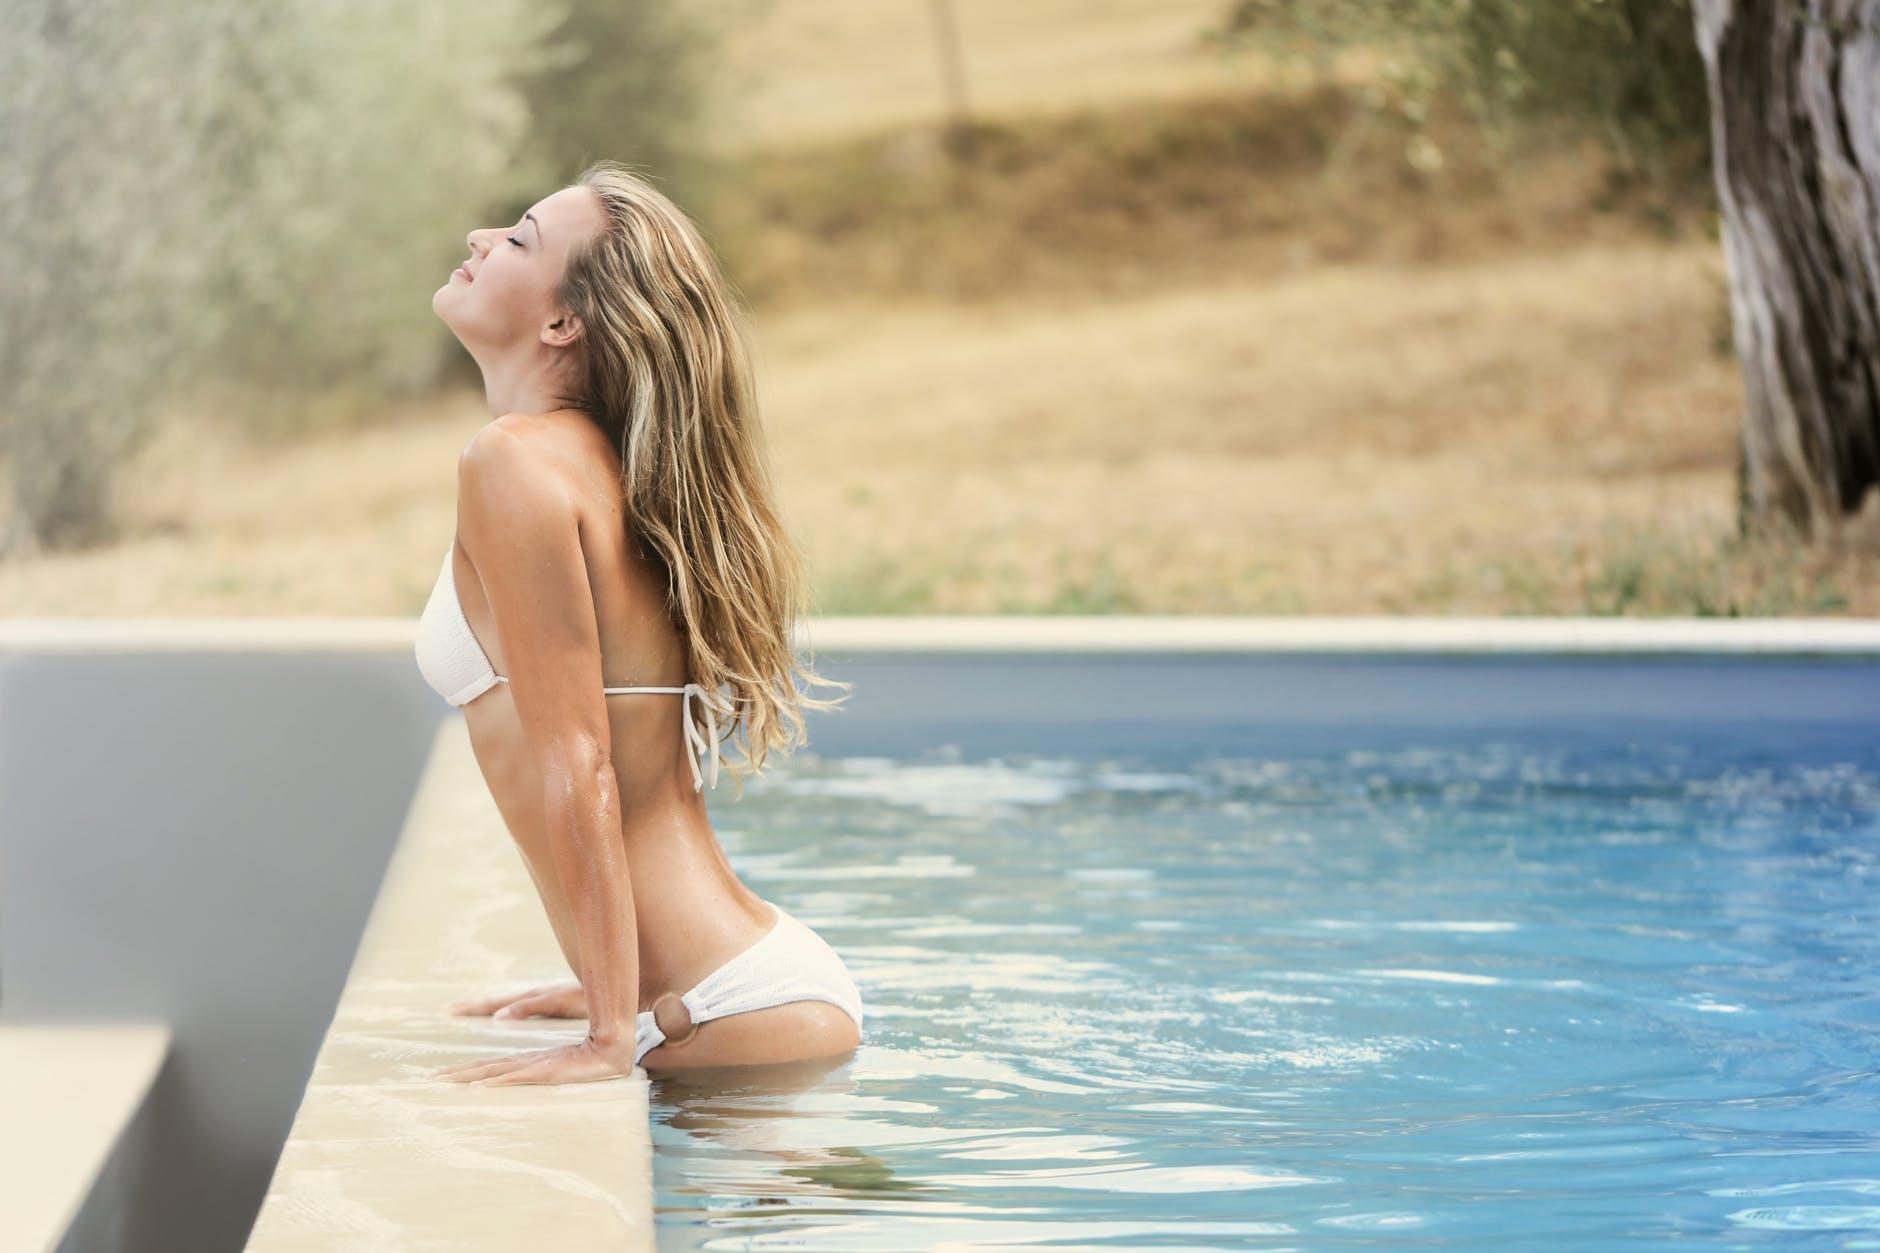 Woman wearing high waisted thong bikini, getting out of the pool